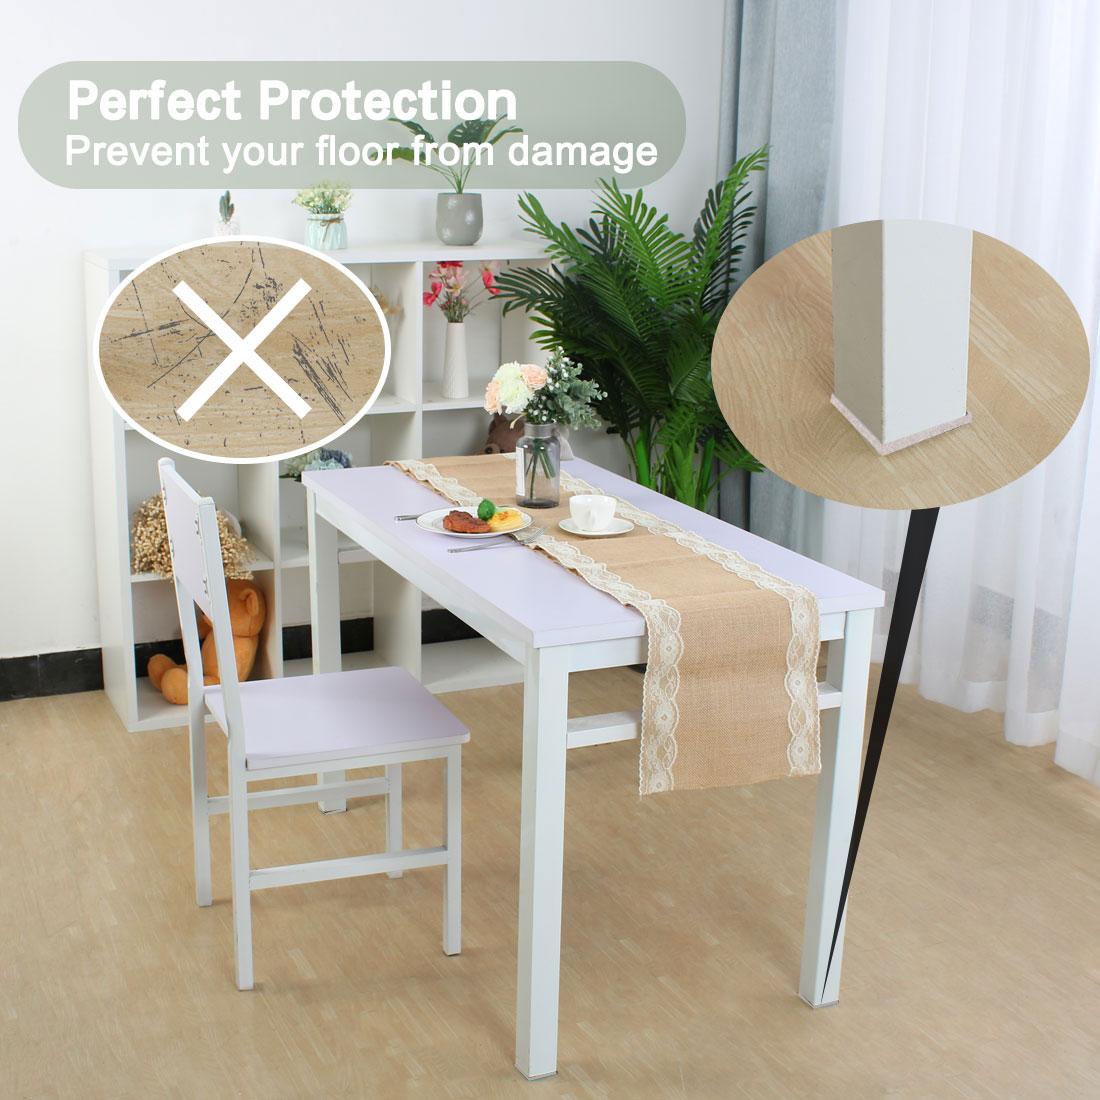 "Furniture Pads Square 1 5/8"" Self-stick for Furniture Floor Protector 12pcs - image 6 de 7"